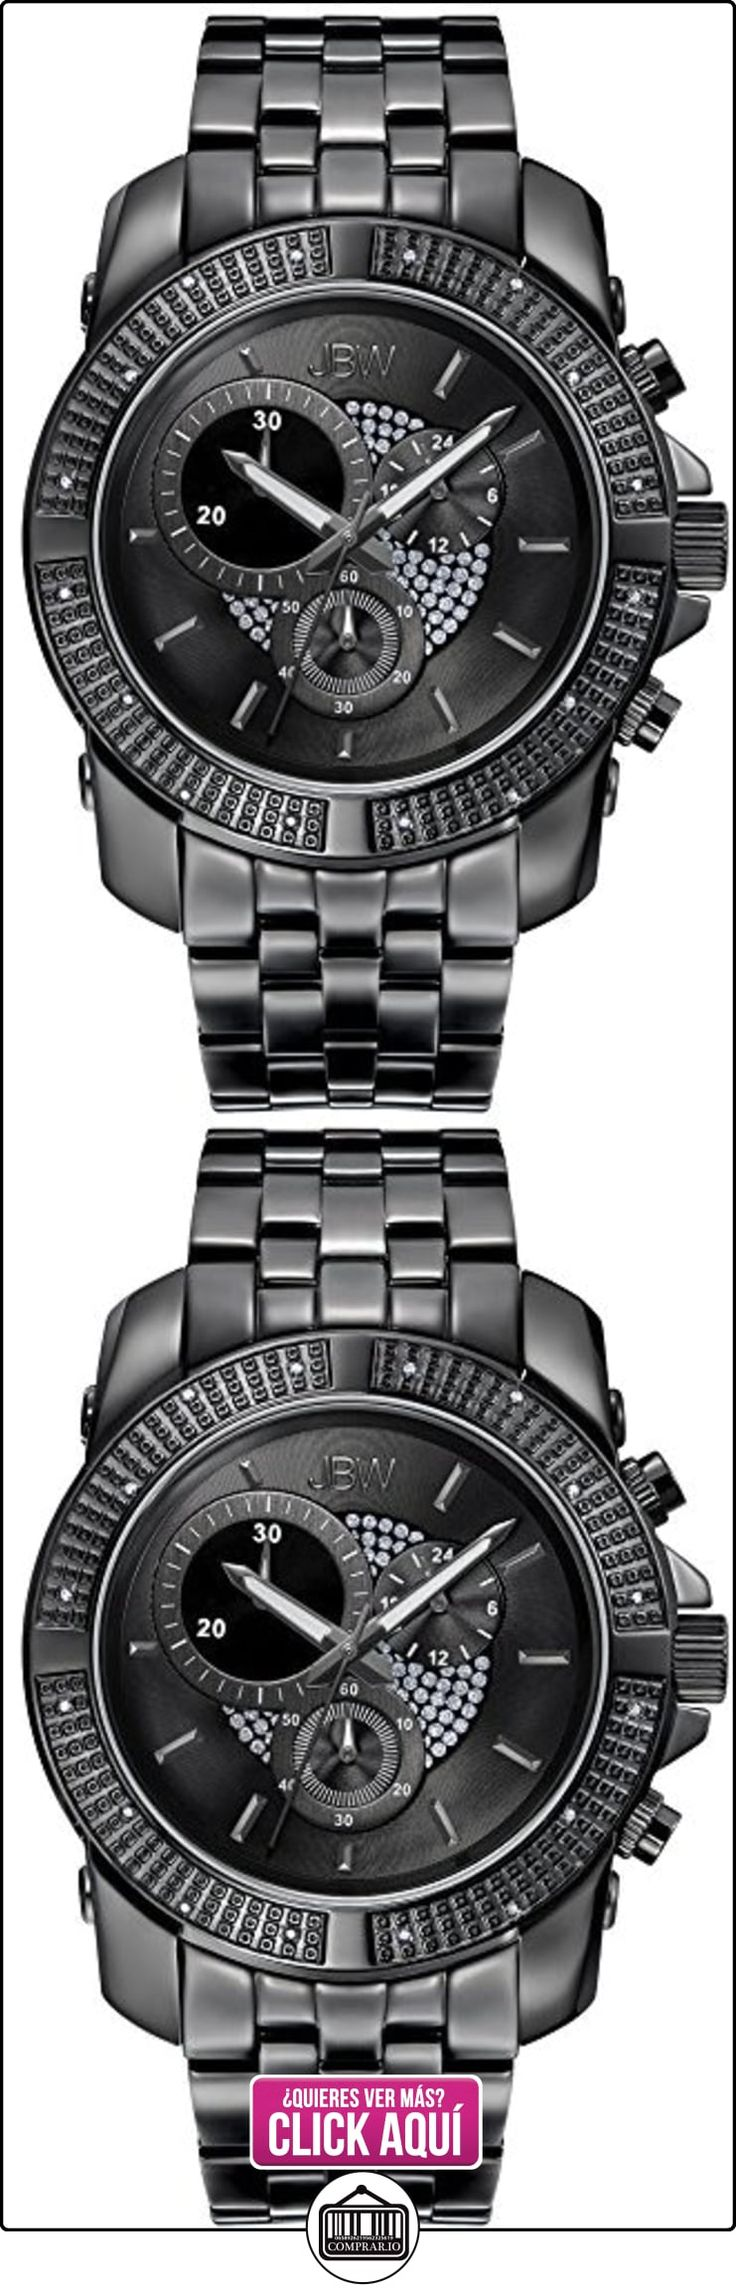 JBW Reloj con movimiento japonés Man Warren Negro 48 mm  ✿ Relojes para hombre - (Lujo) ✿ ▬► Ver oferta: http://comprar.io/goto/B01BMOUXC2